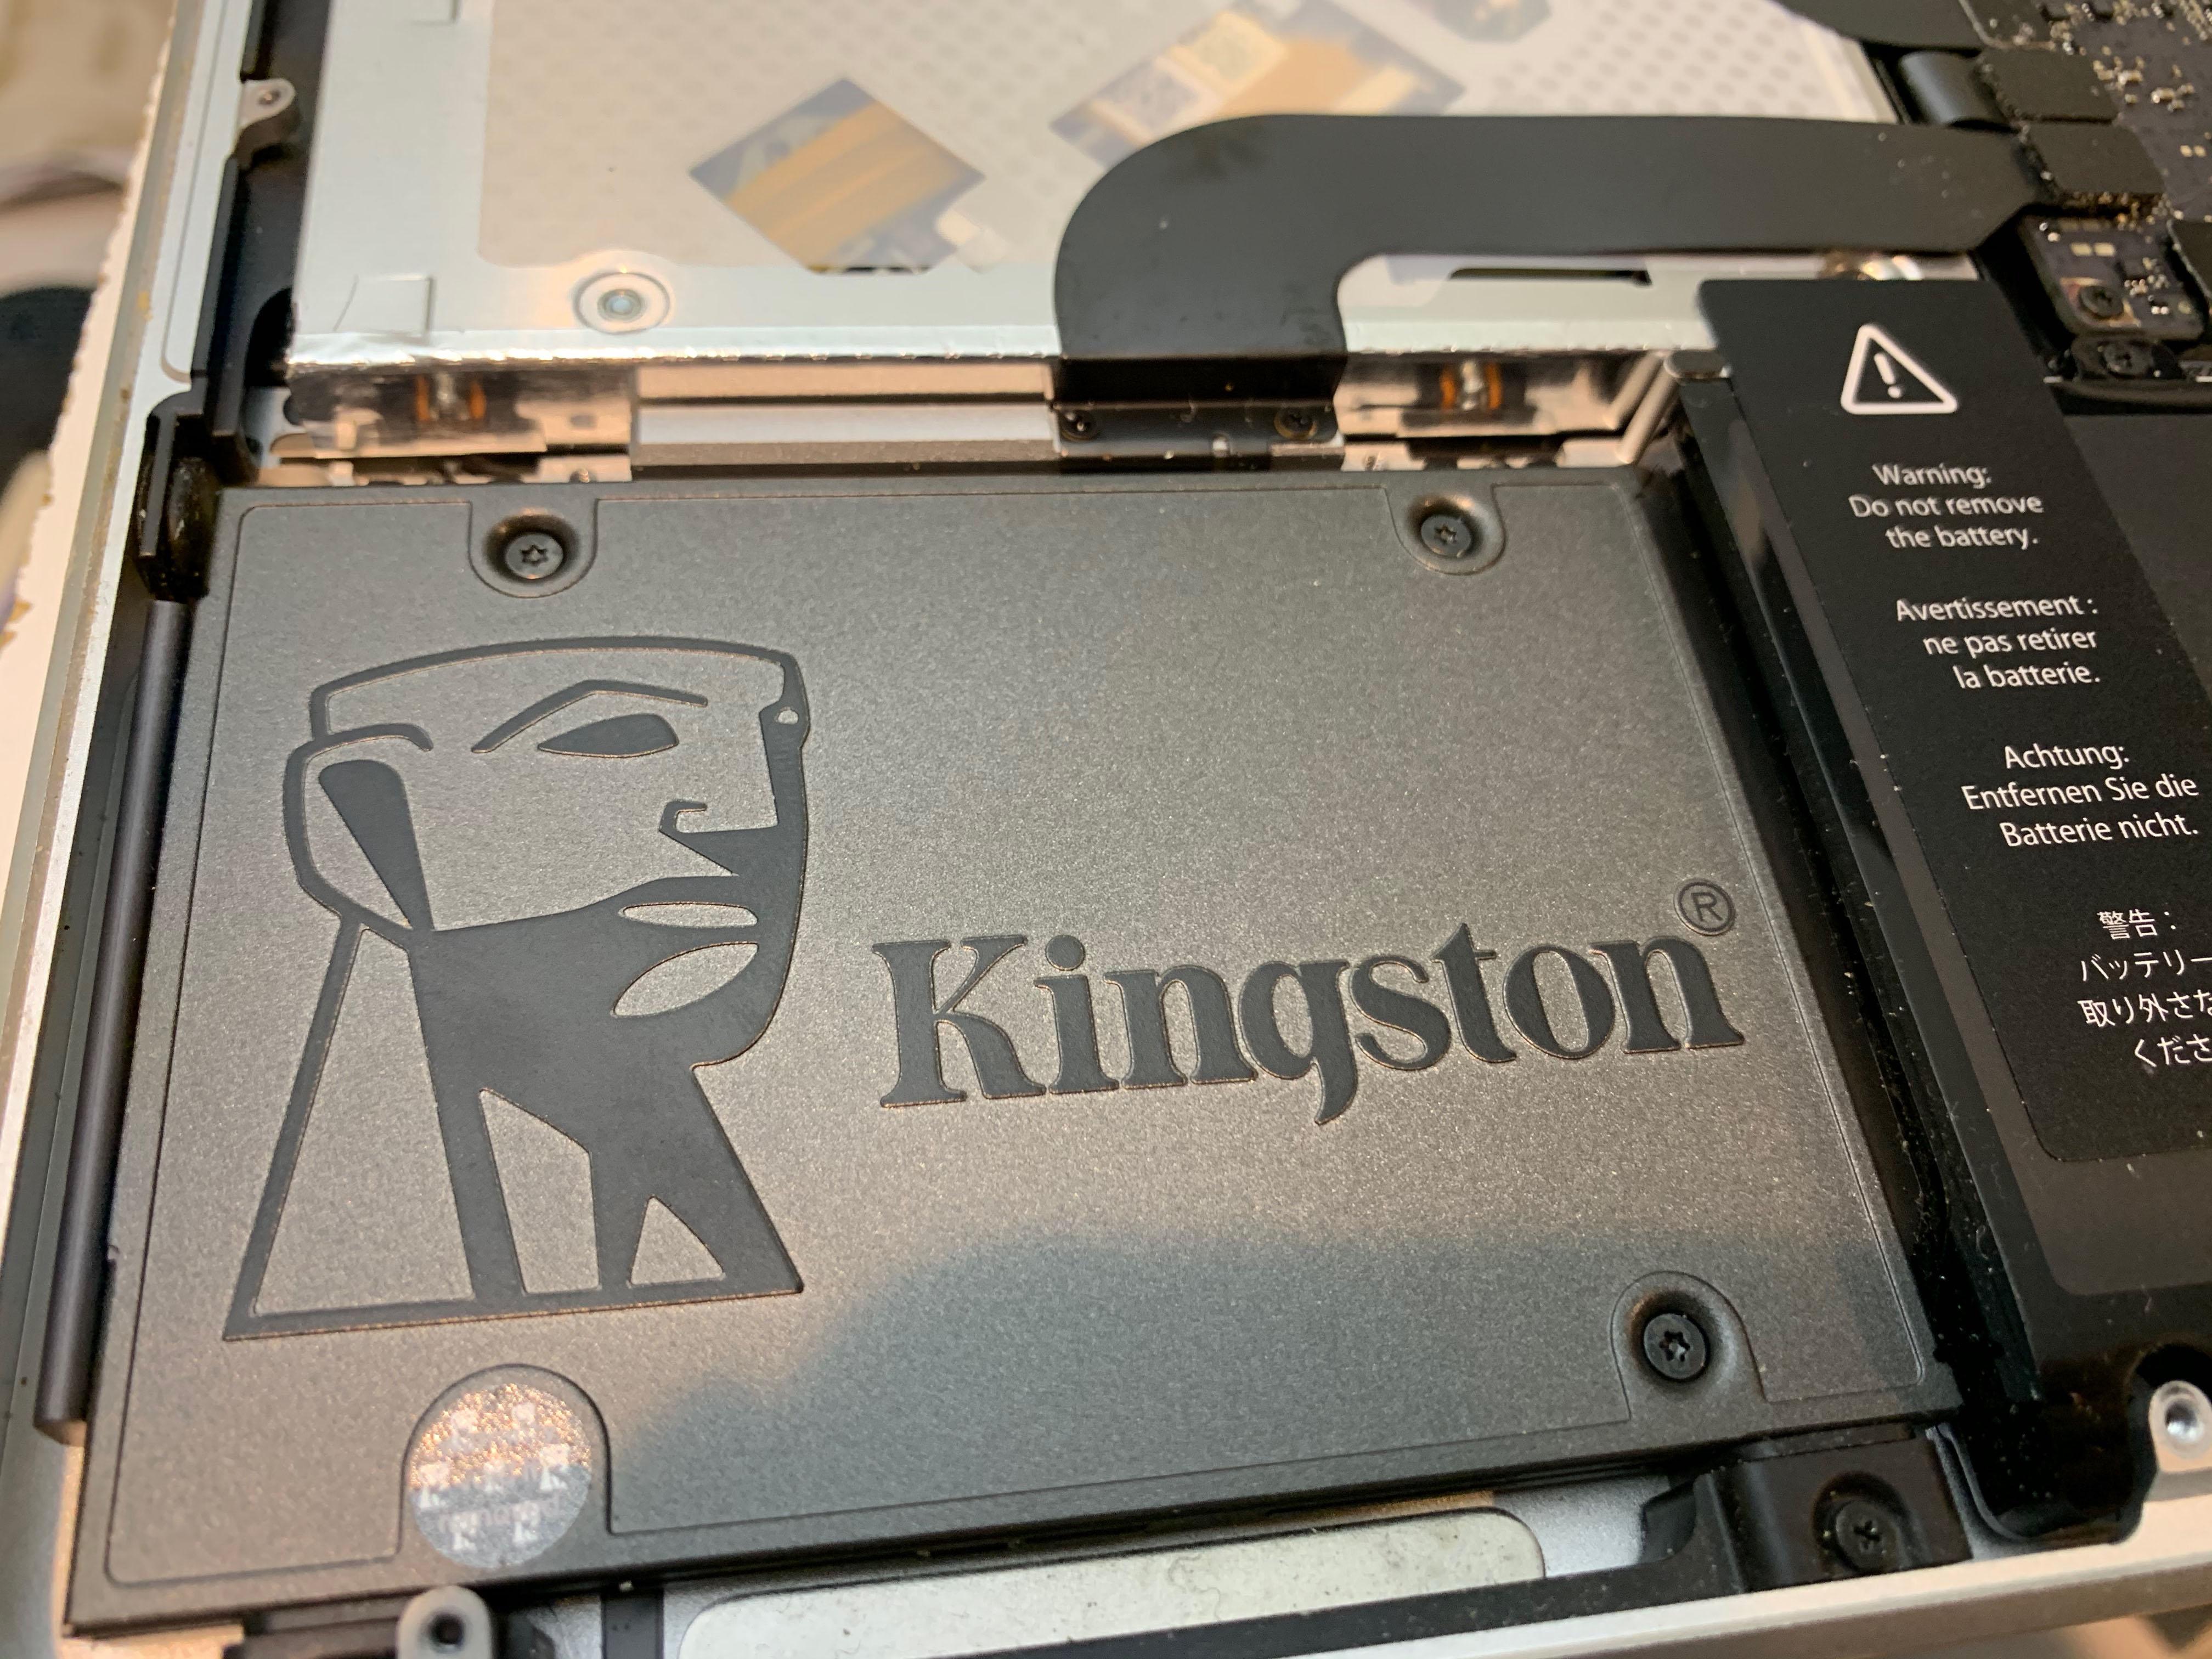 13-inch MacBook Pro SSD